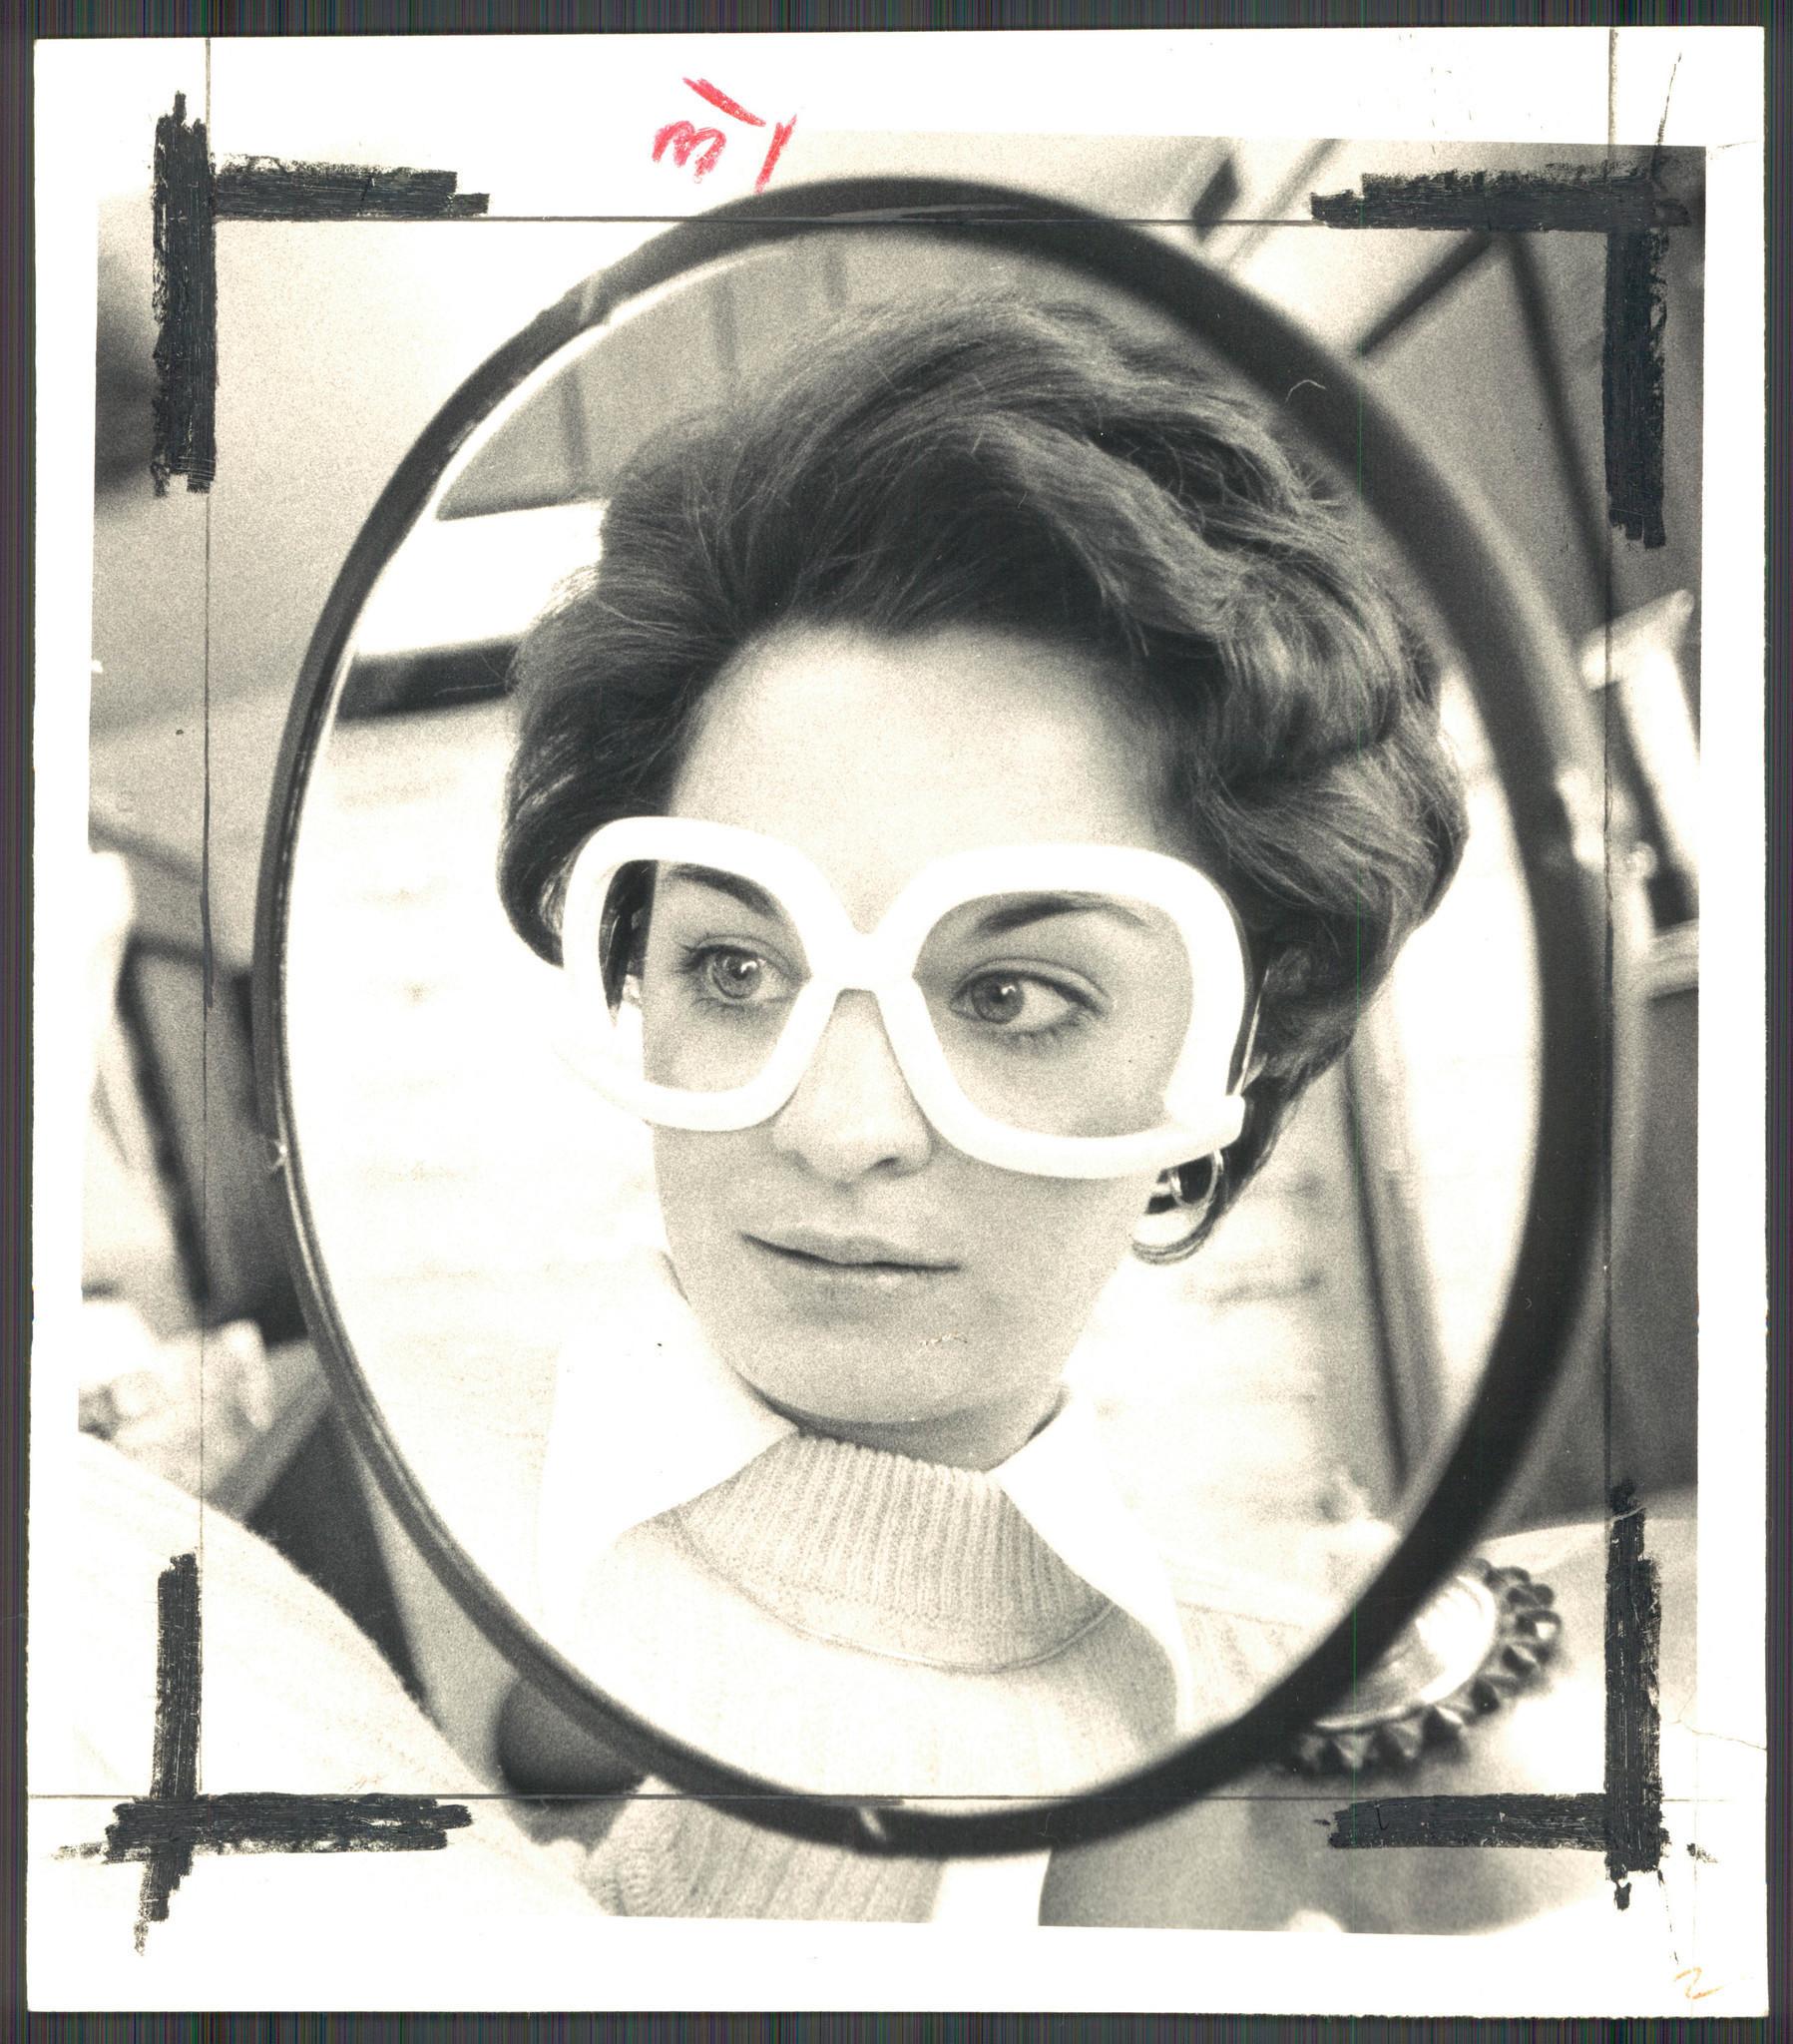 Eyeglass Frames Baltimore : Retro eyeglasses - Baltimore Sun